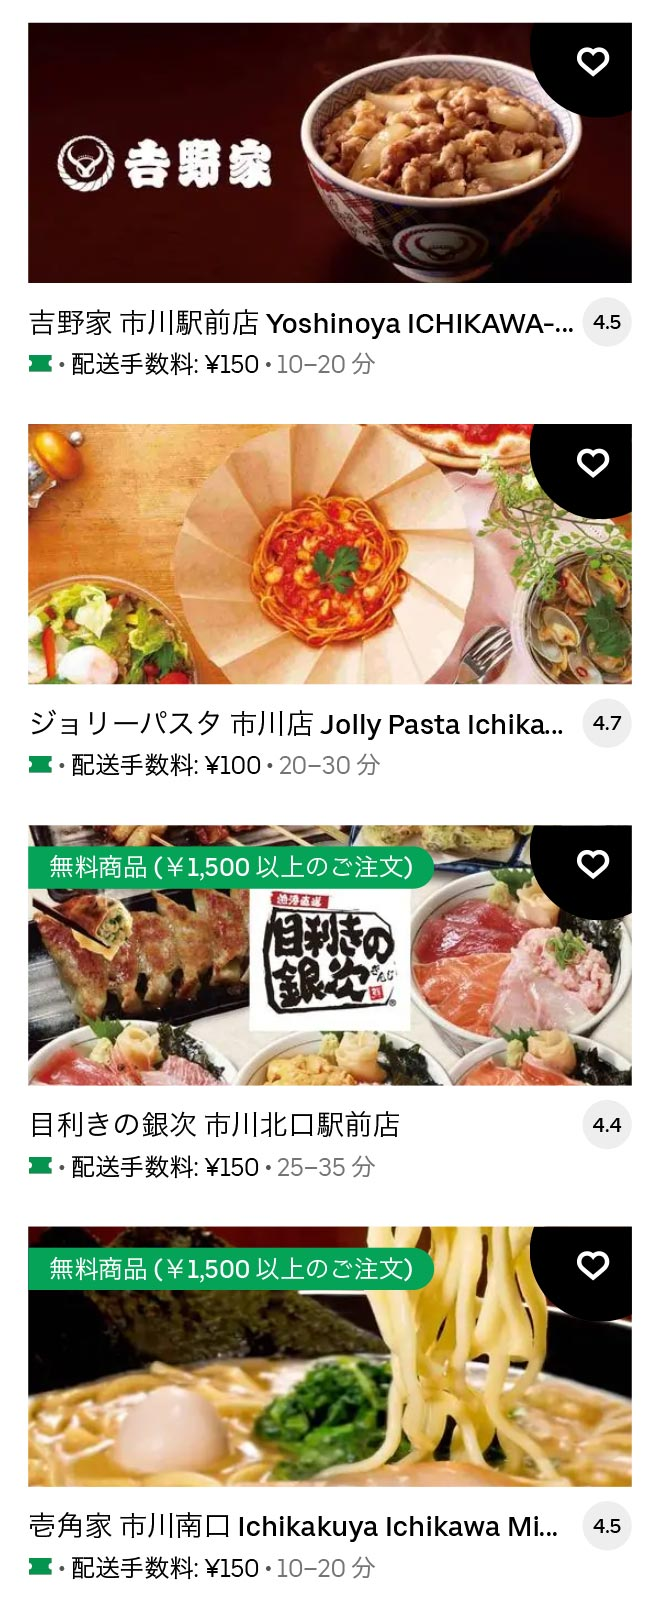 U ichikawa 2105 06